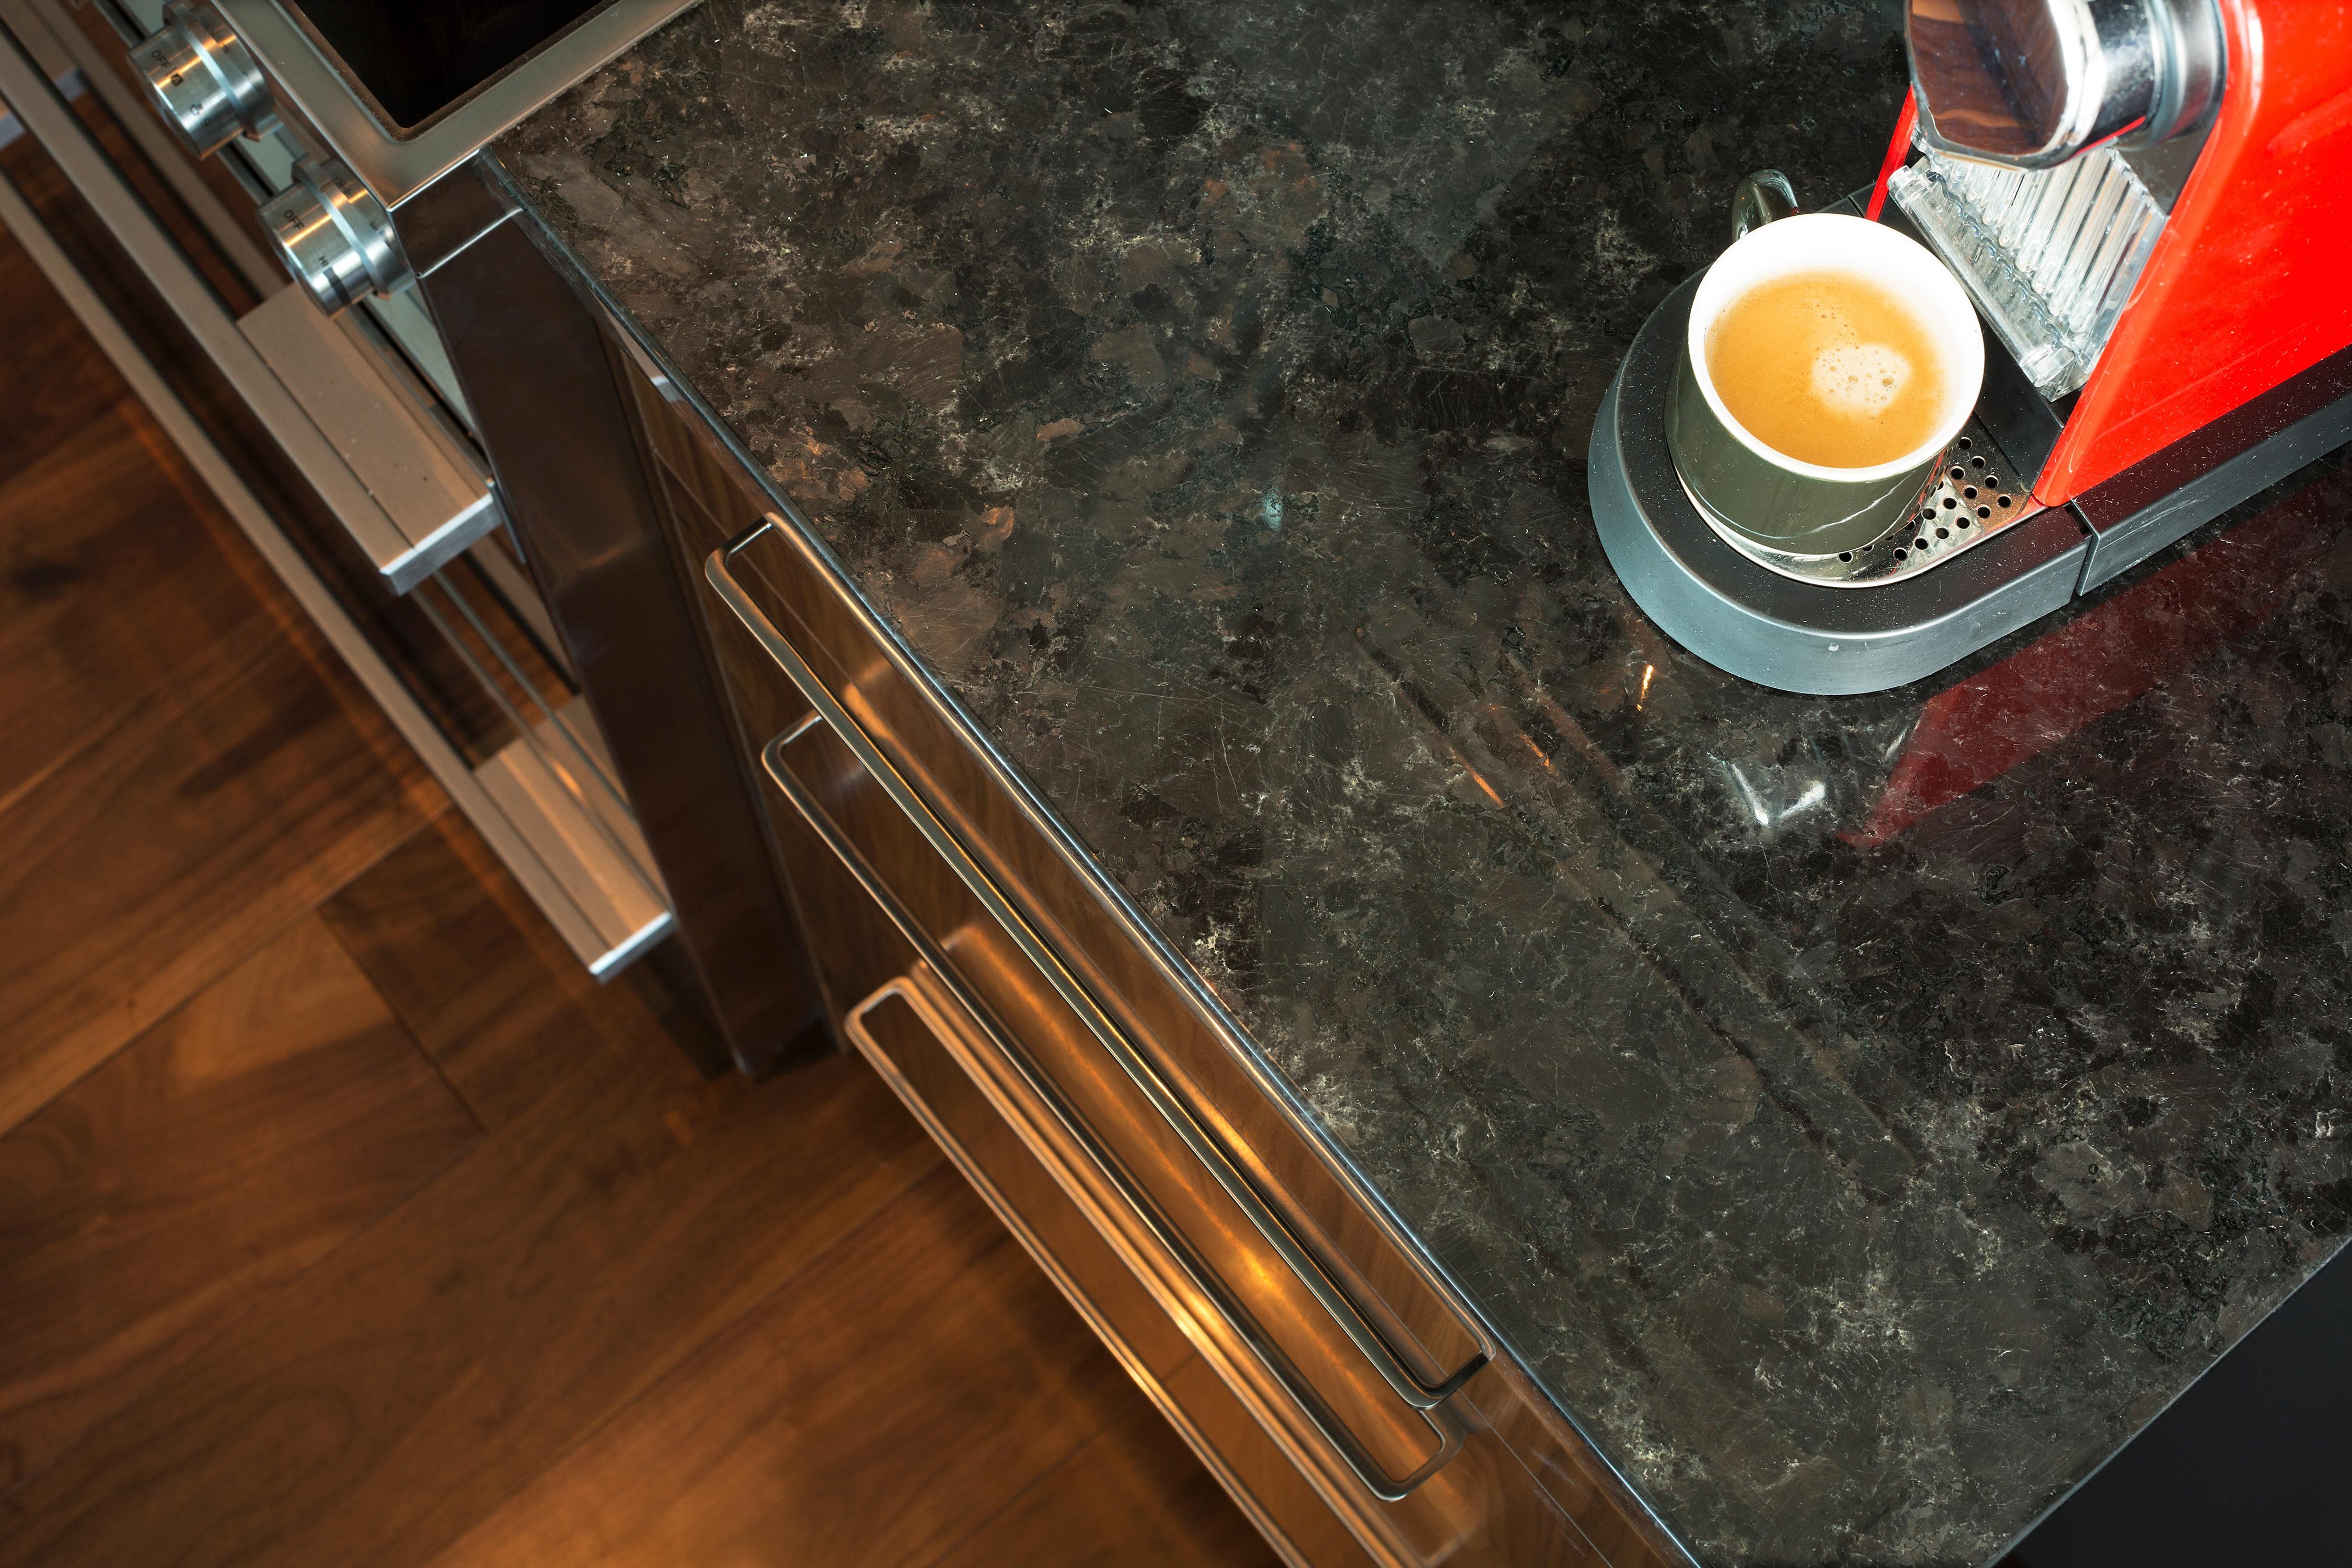 Meet Mega Crystal: Likes Shiny, Plays Well With Wood [PHOTOS]